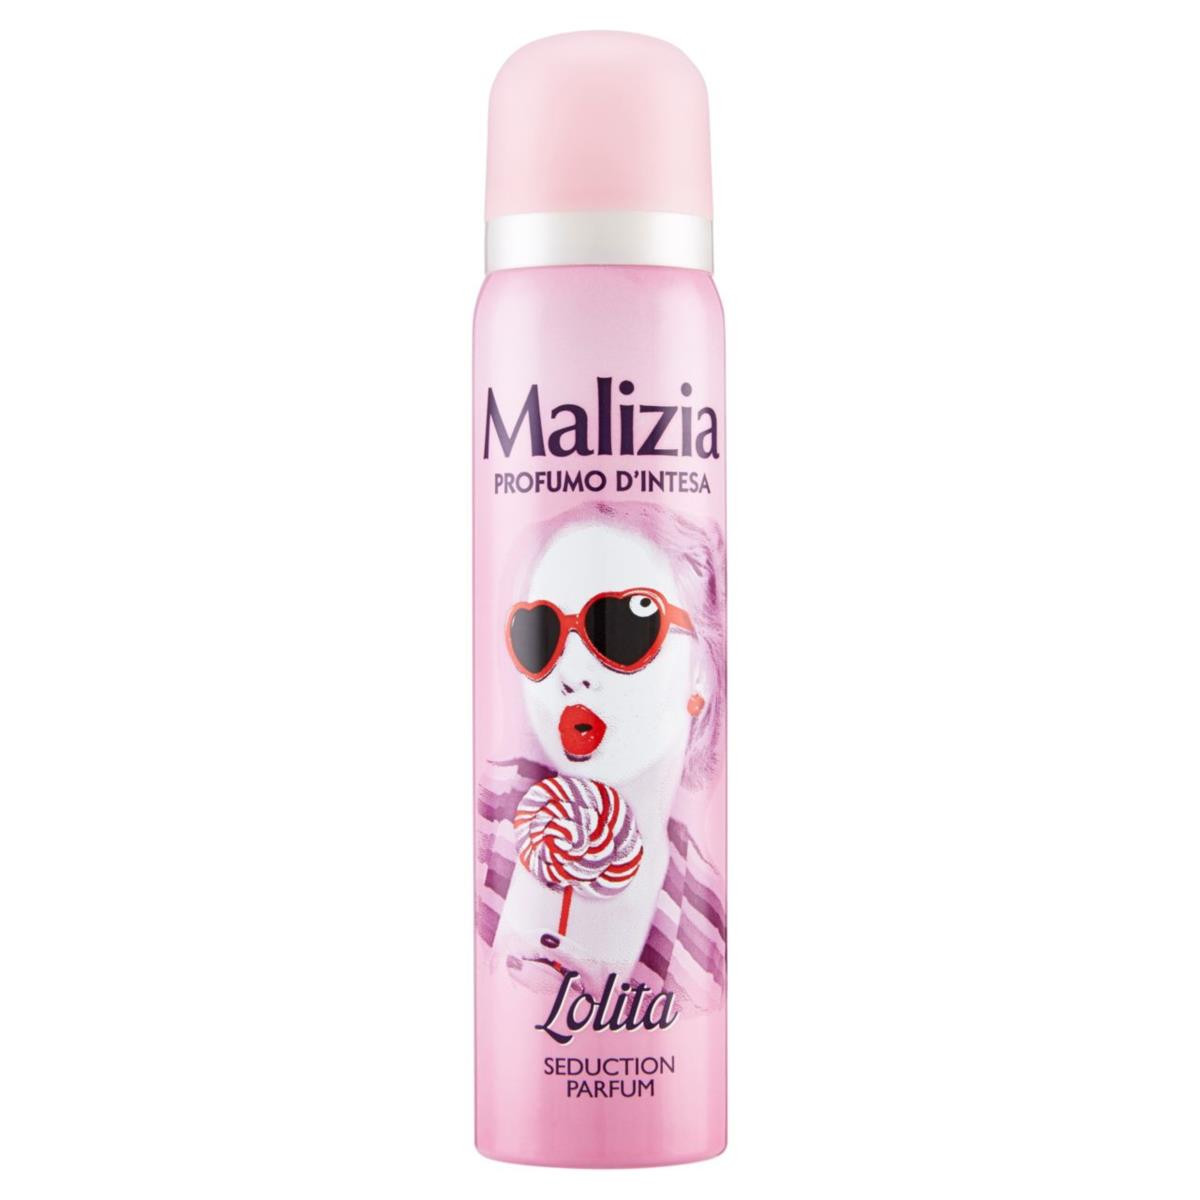 اسپری زنانه مالیزیا مدل لولیتا